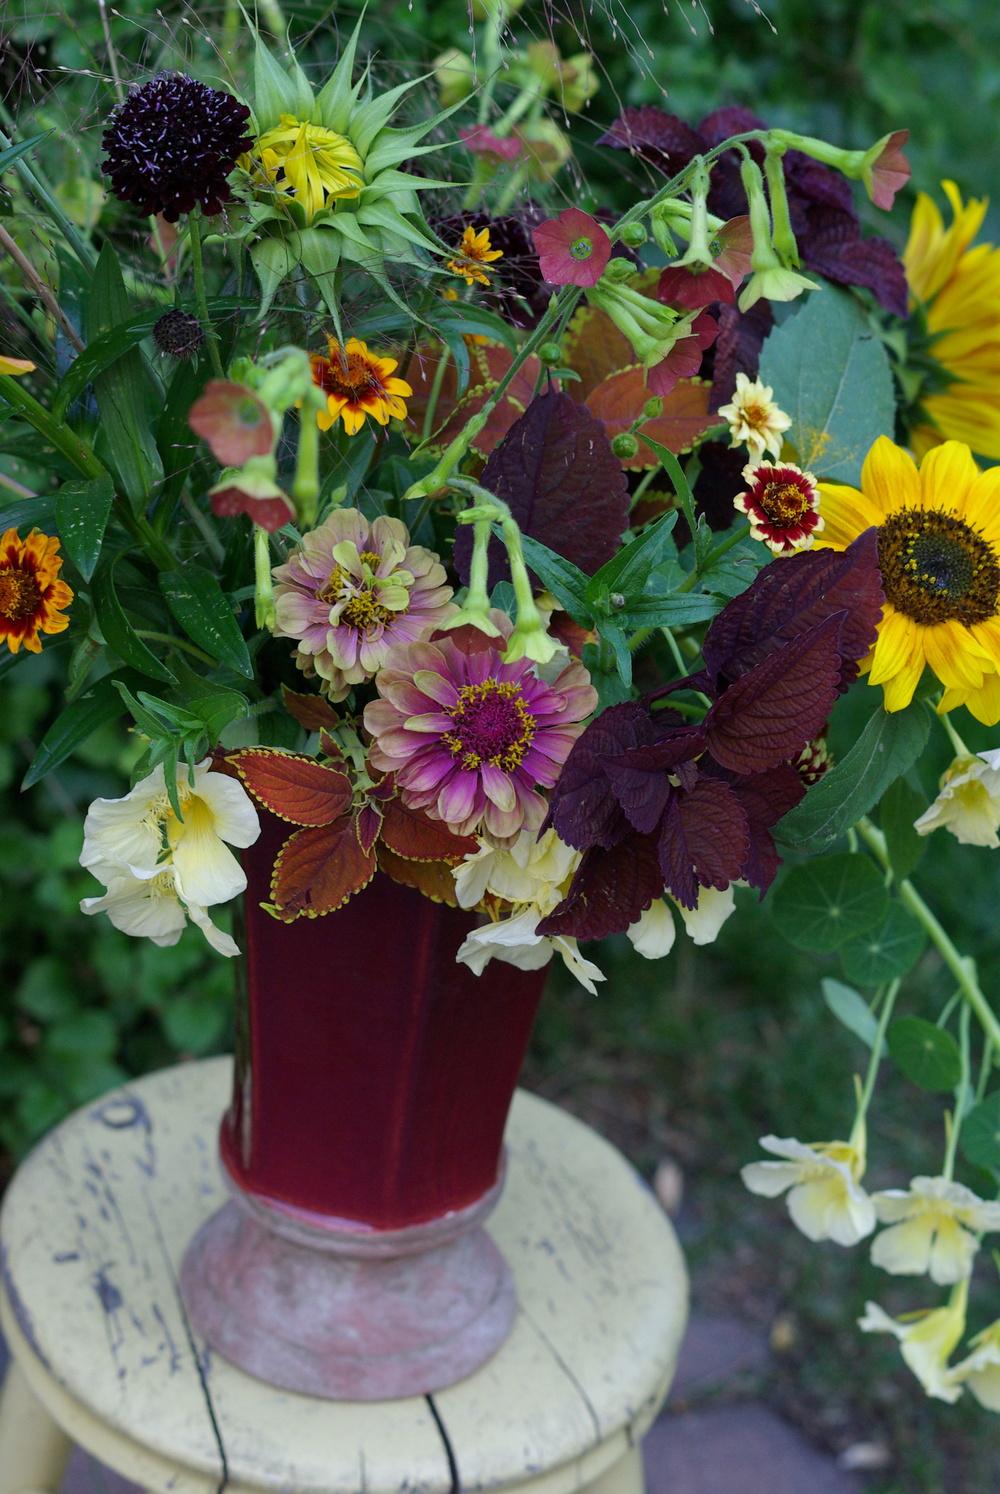 Mid-August - zinnias, nasturtiums, nicotiana, coleus, sunflowers, scabiosa, frosted explosion grass